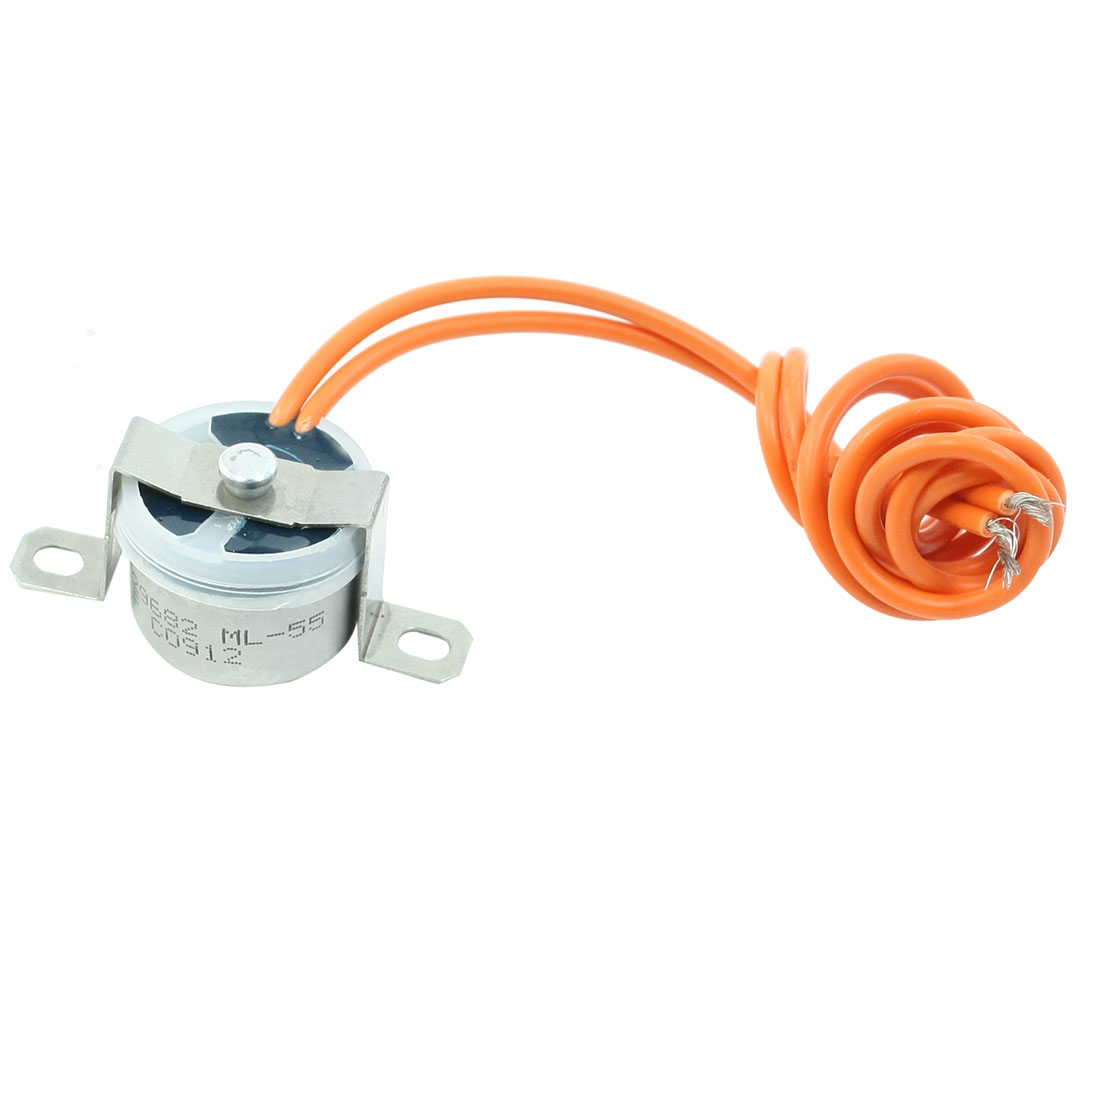 ML55 L55-35F Universal Refrigerator Defrost Thermostat